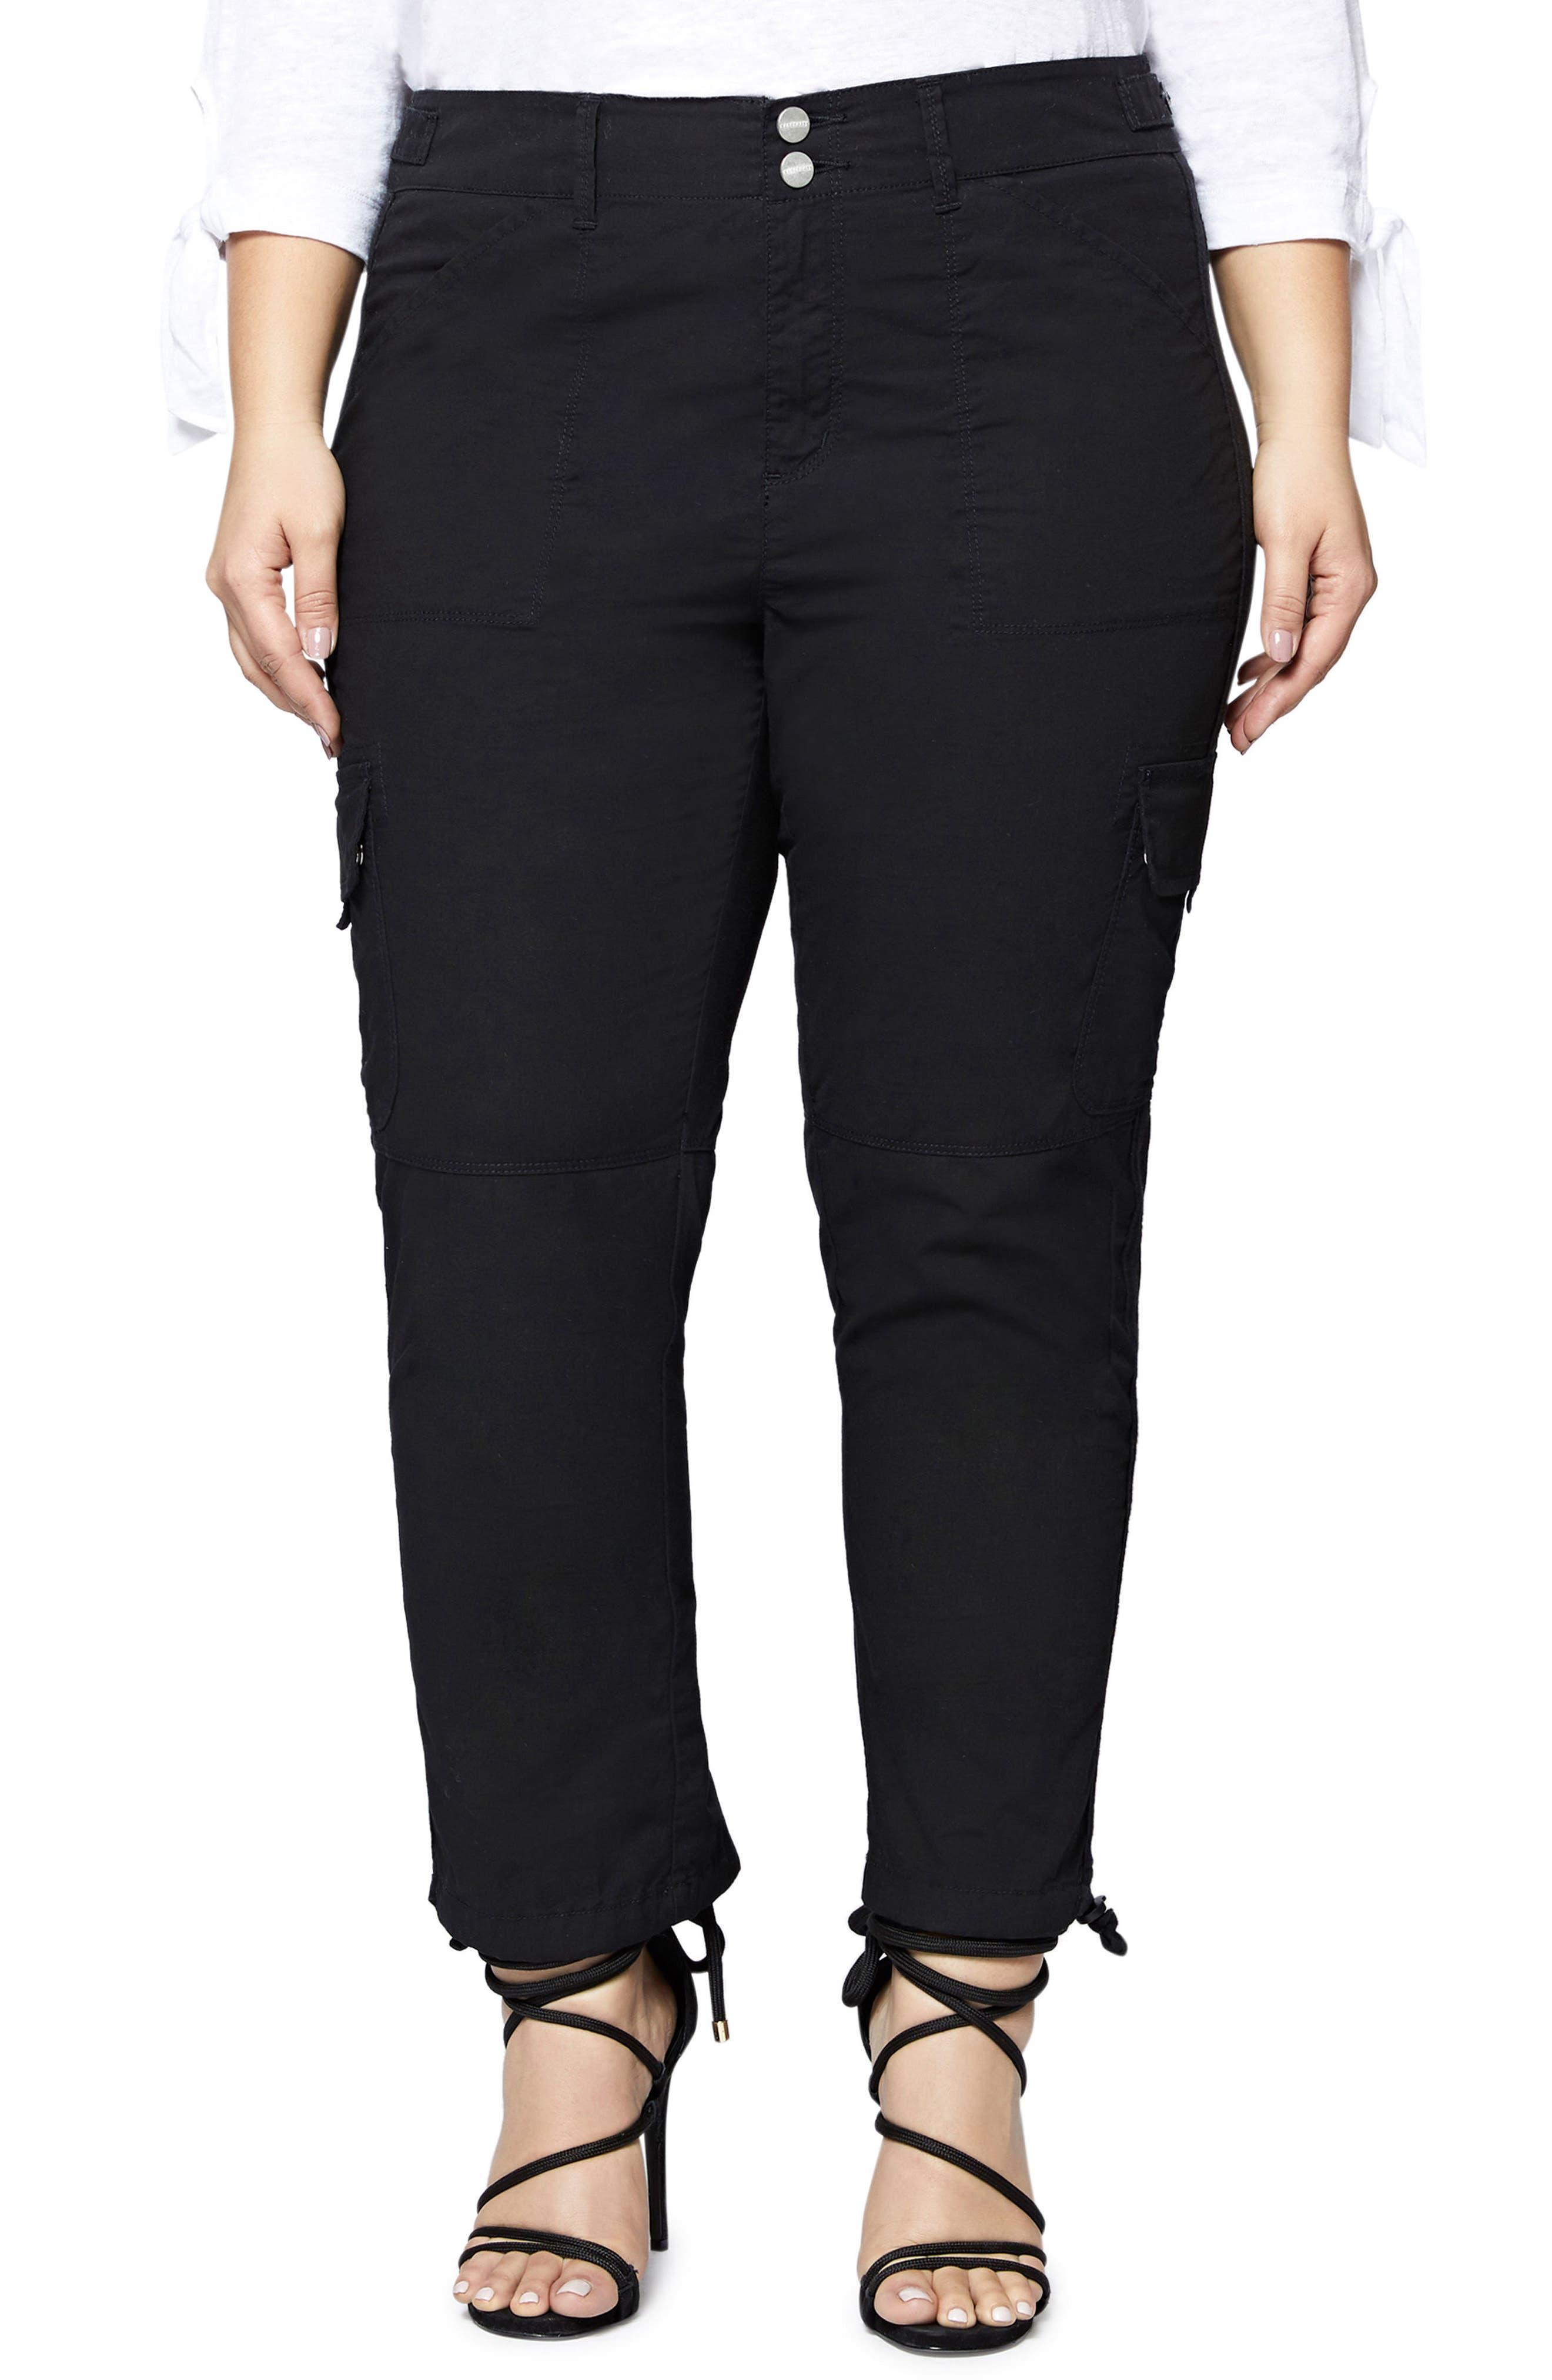 Terrain Crop Cargo Pants,                         Main,                         color, Black